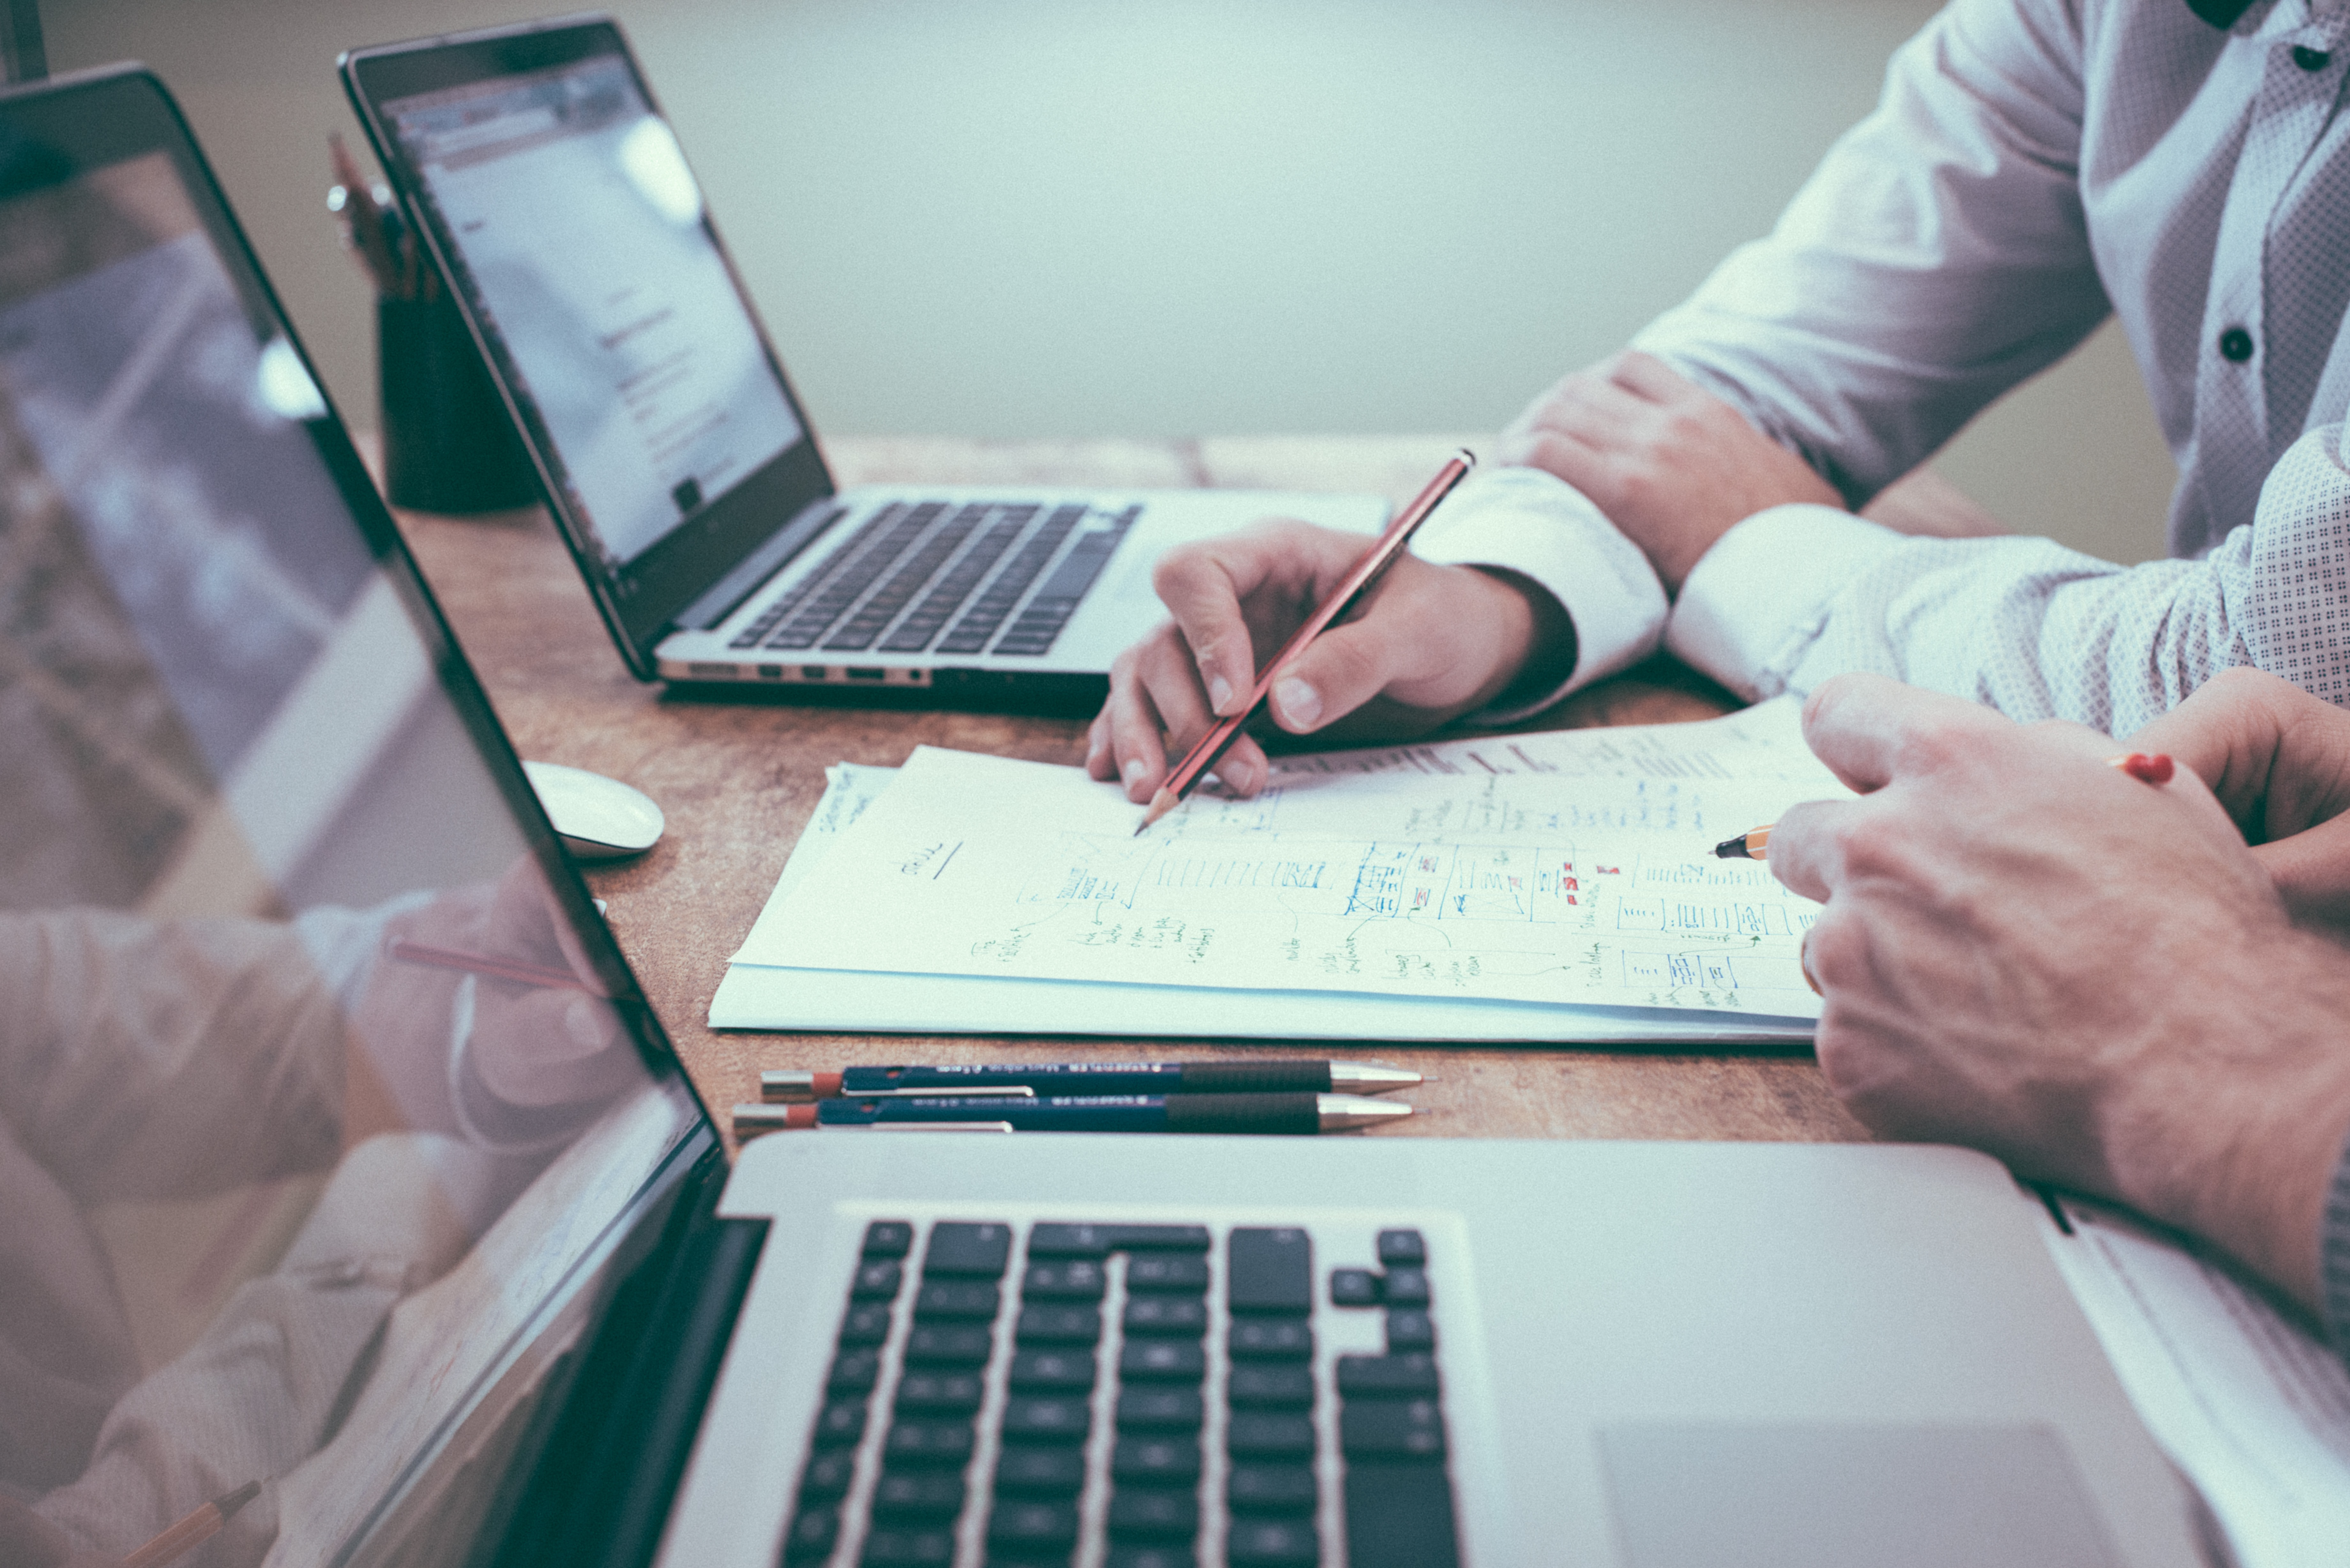 Anxieties around managing organisational change